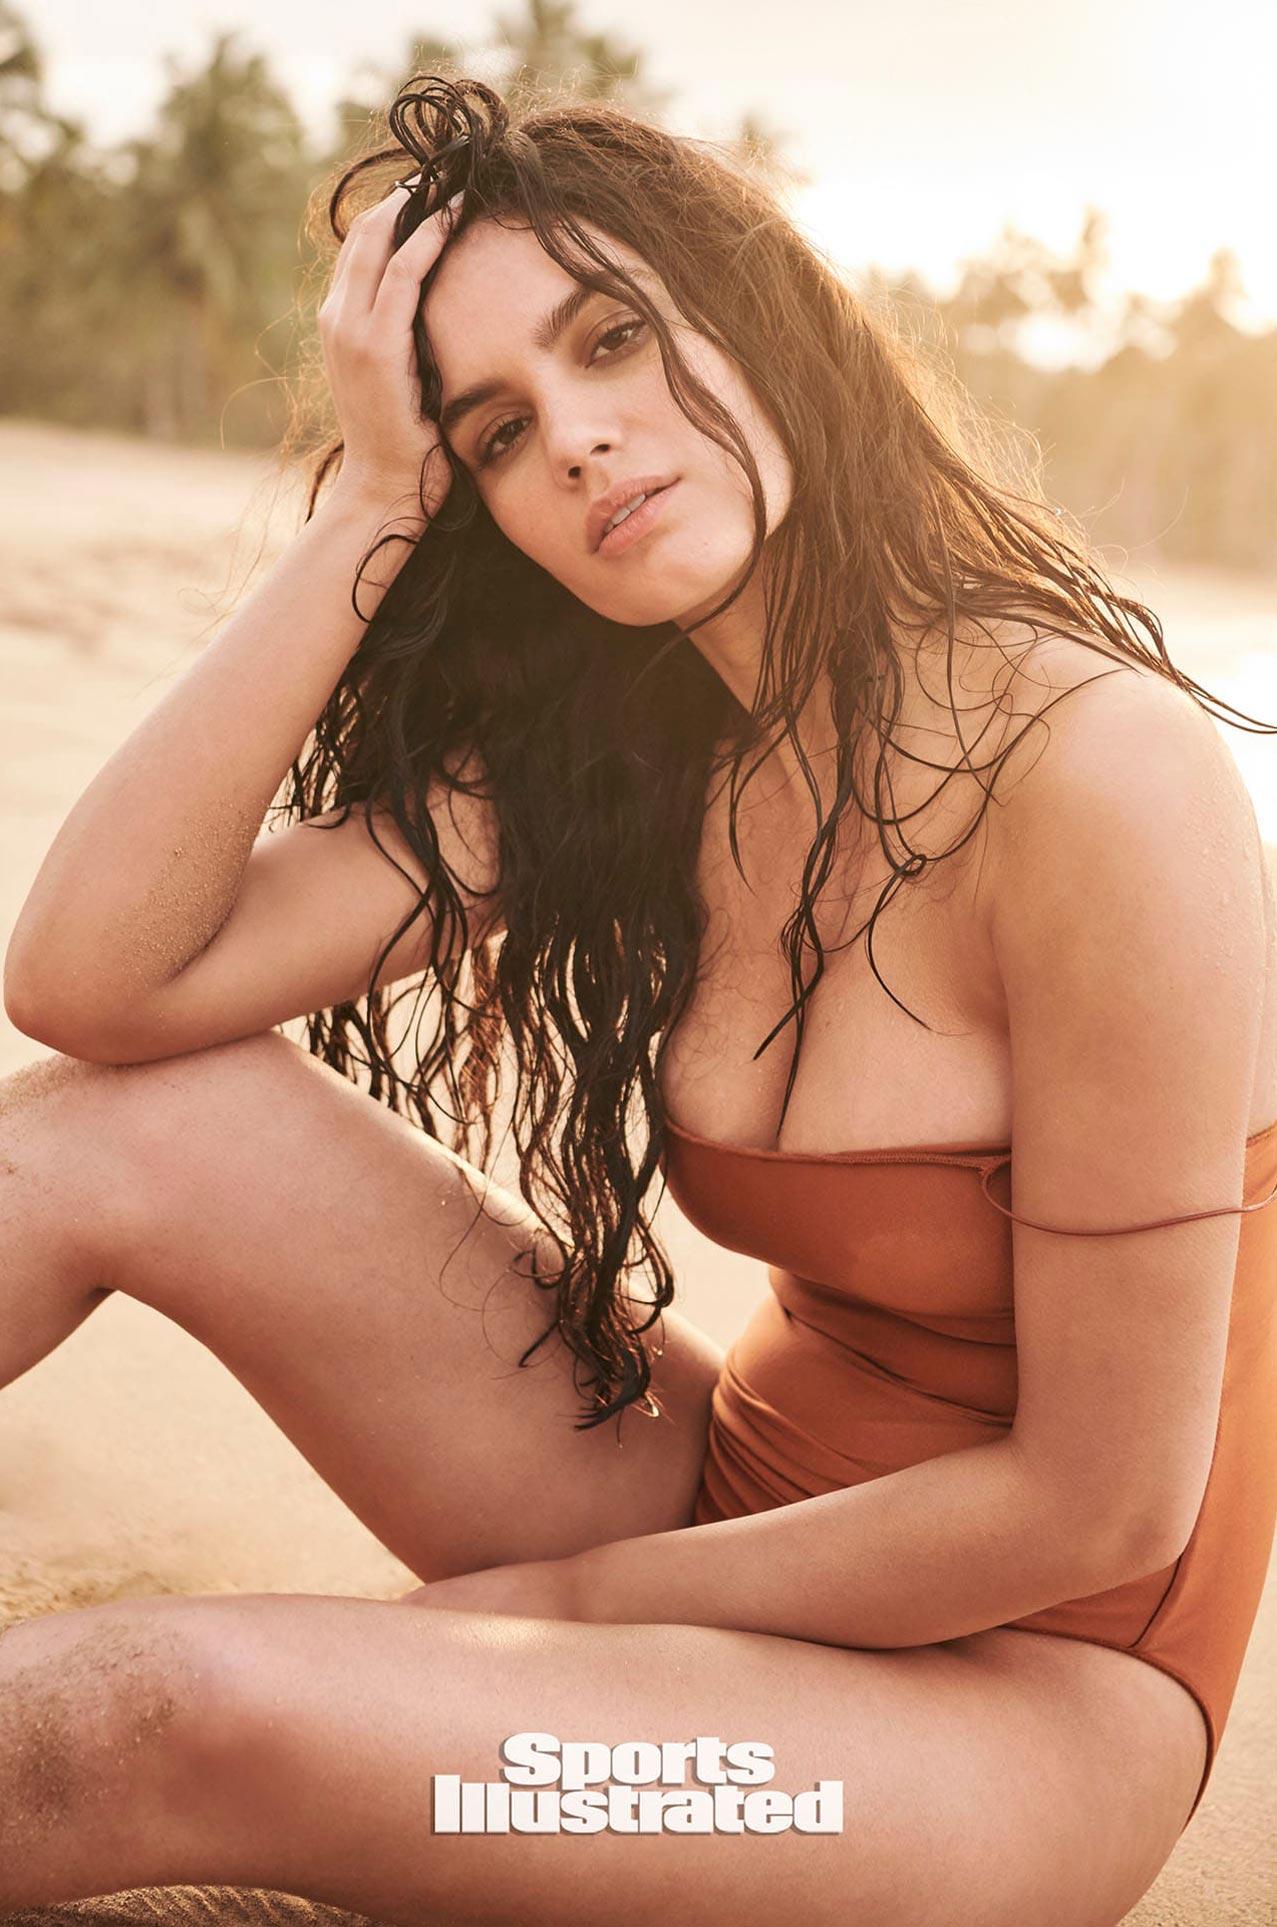 Энн де Паула в каталоге купальников Sports Illustrated Swimsuit 2020 / фото 15